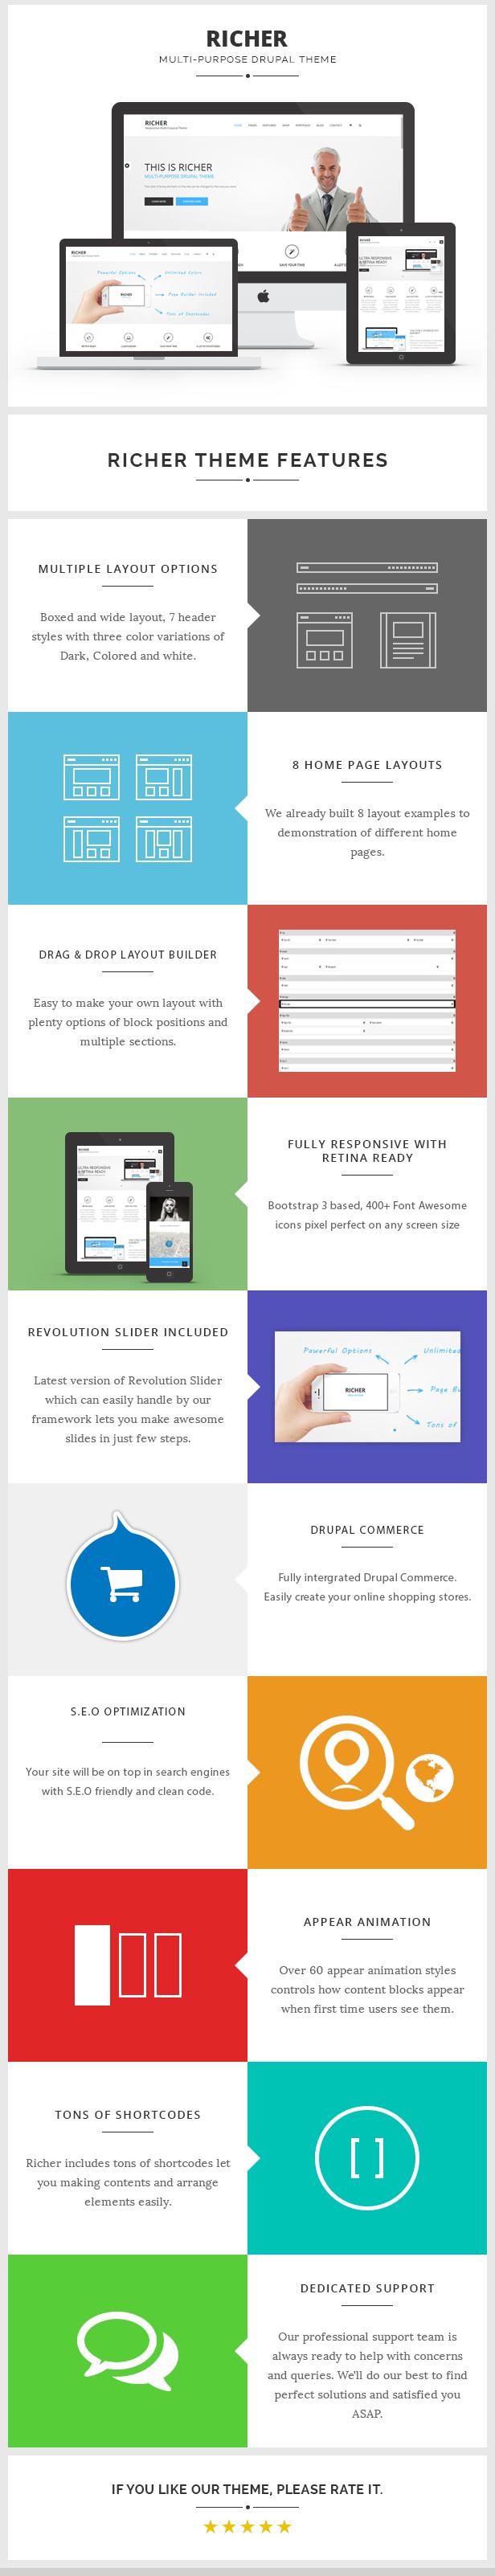 Richer - Multi Purpose, eCommerce Drupal Theme